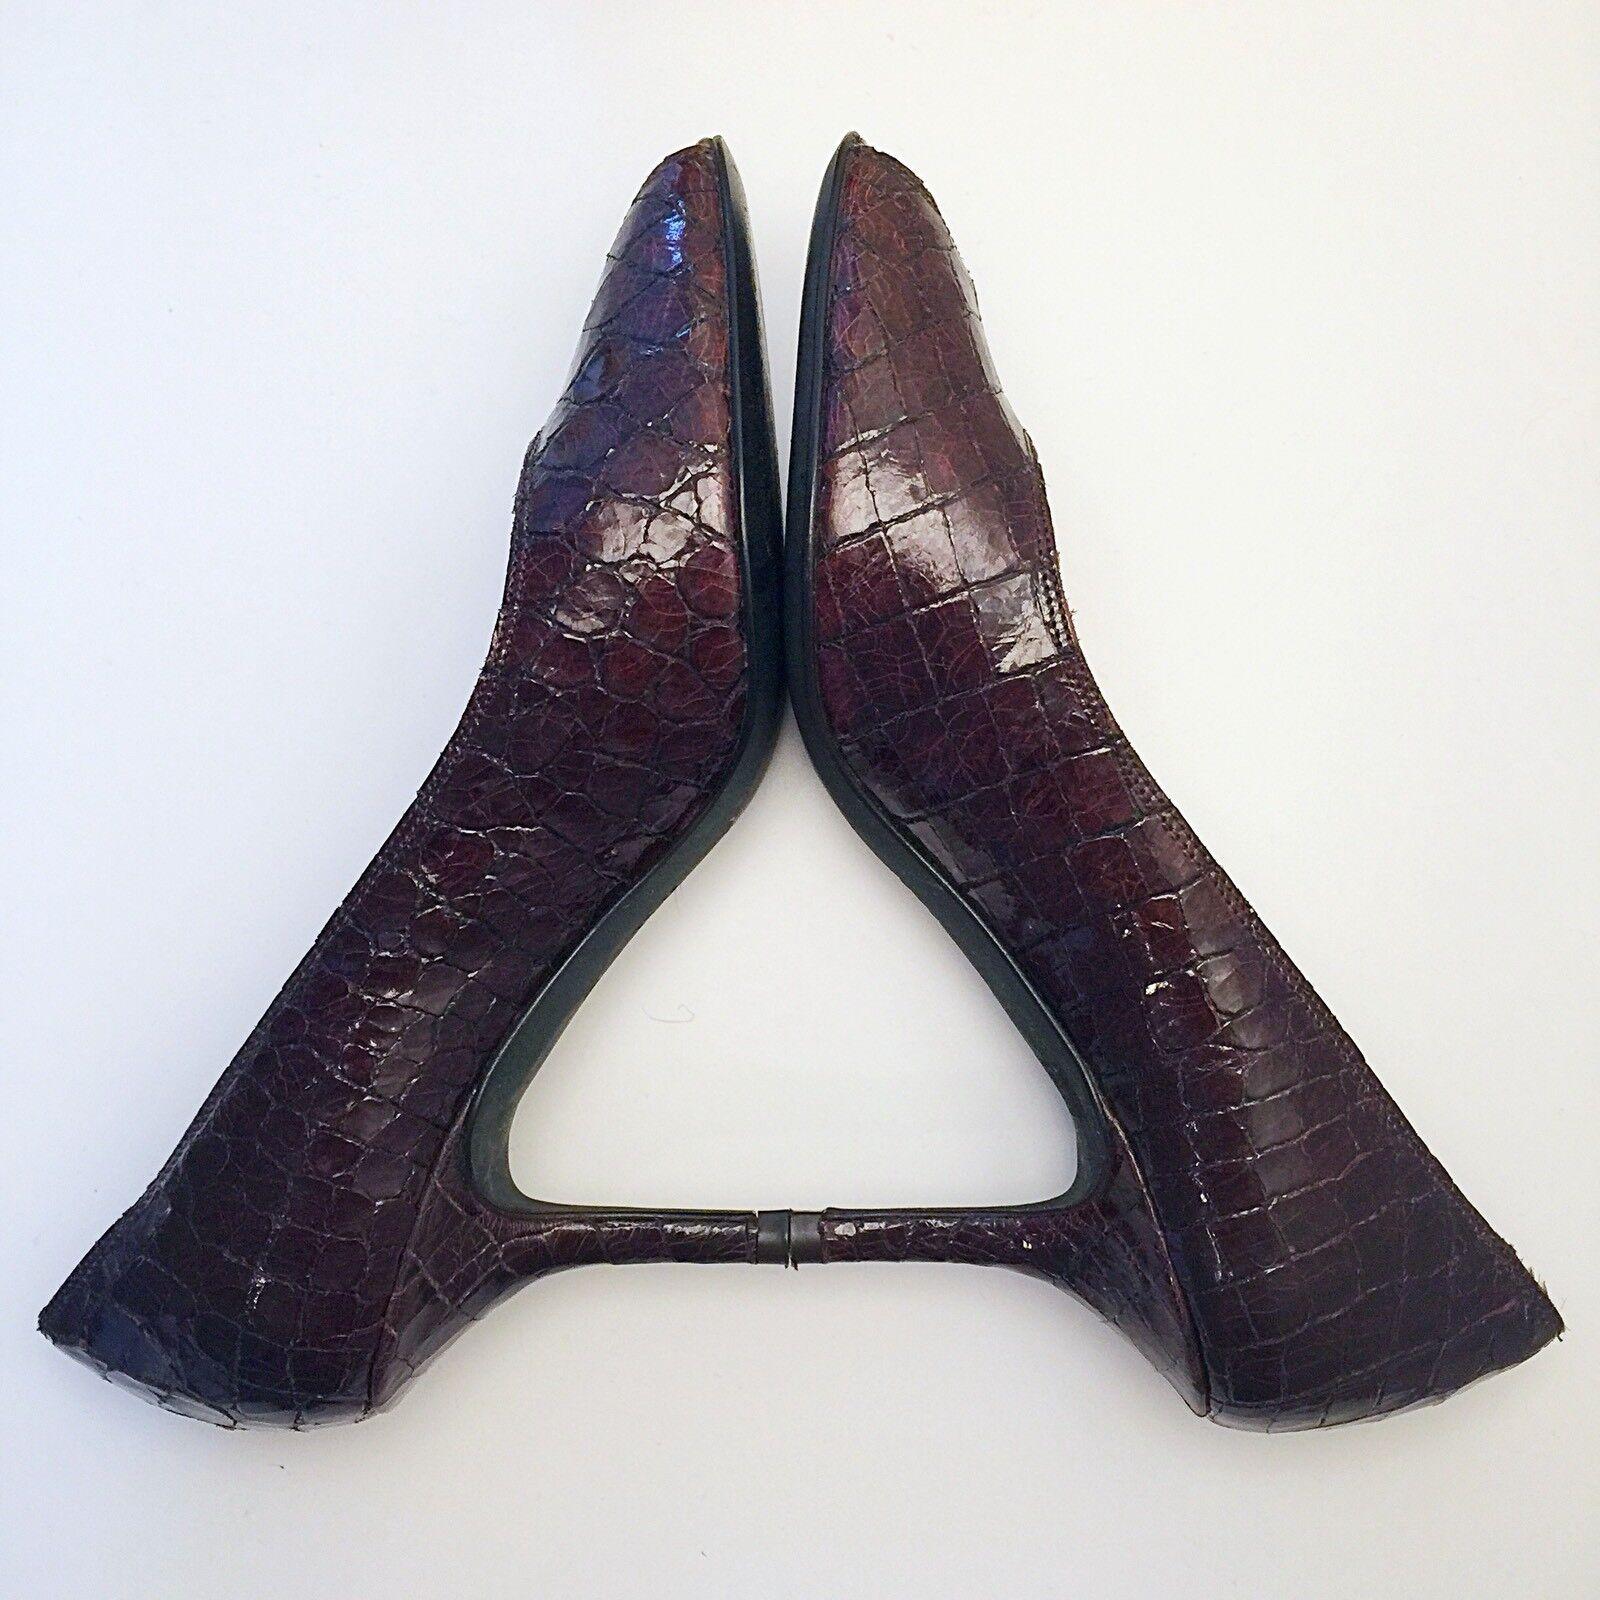 400 Donald J Pliner Braun Patent Heels Python Leder Open Toe Heels Patent Schuhes Größe 7M 3287f7